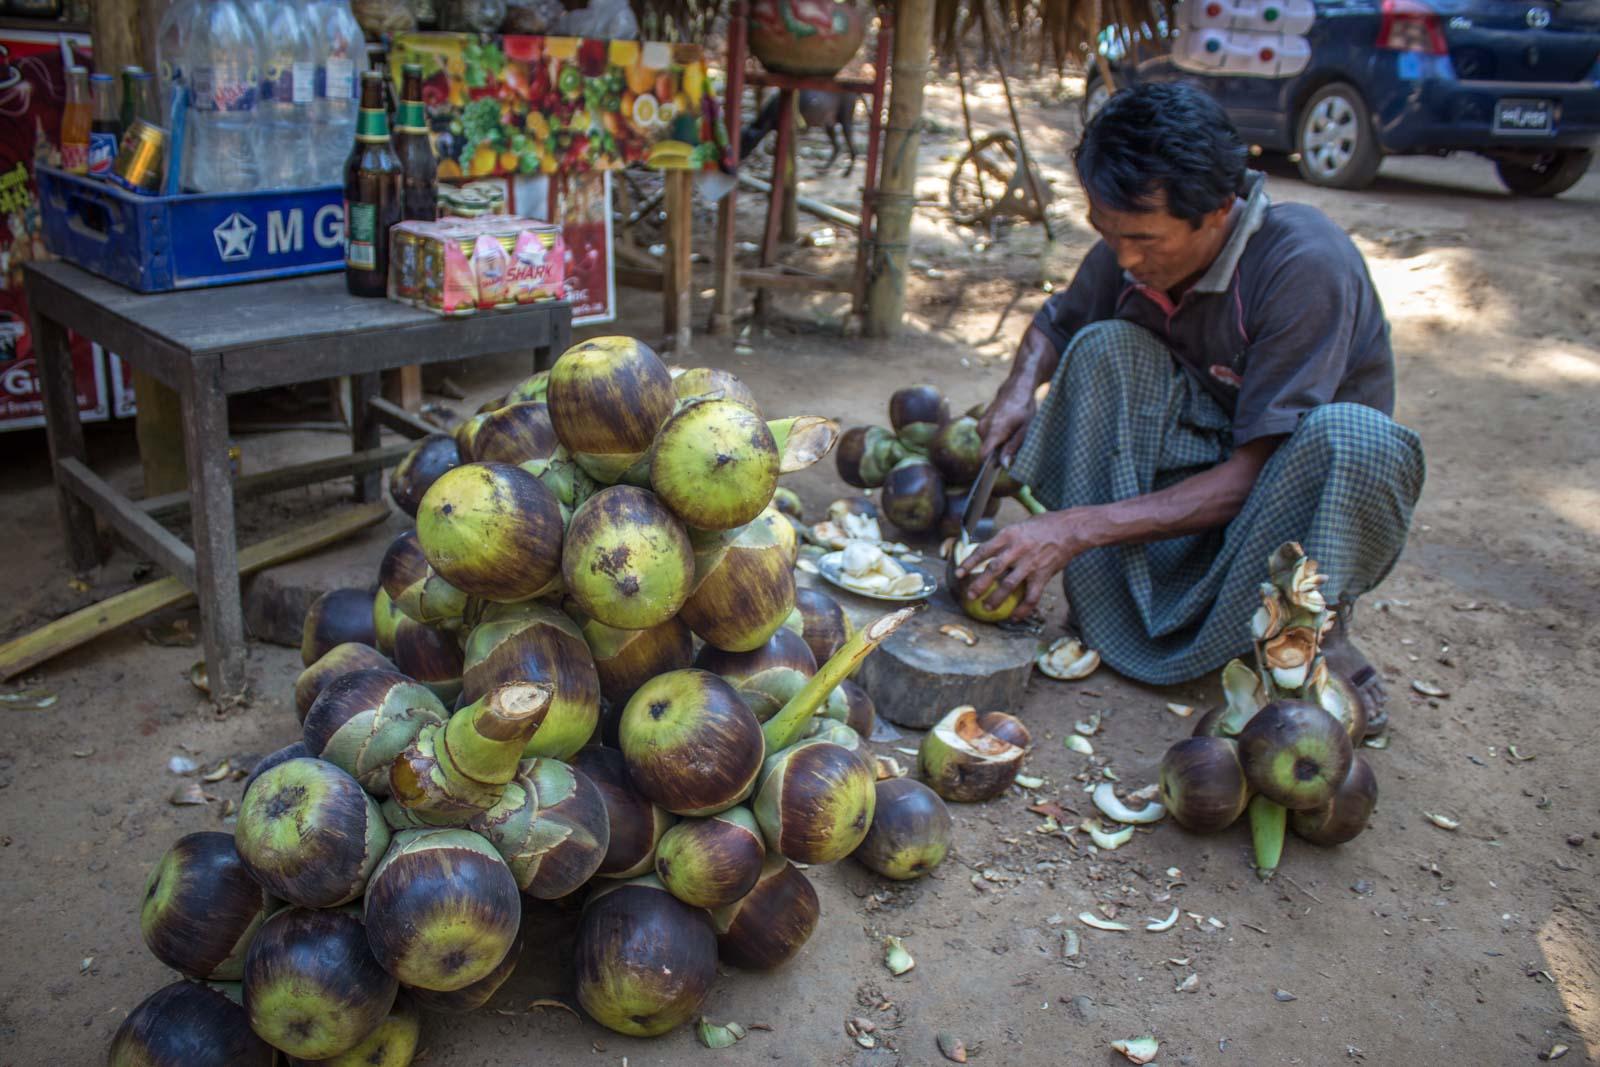 Things to see in Bago, Tour of Bago, Myanmar